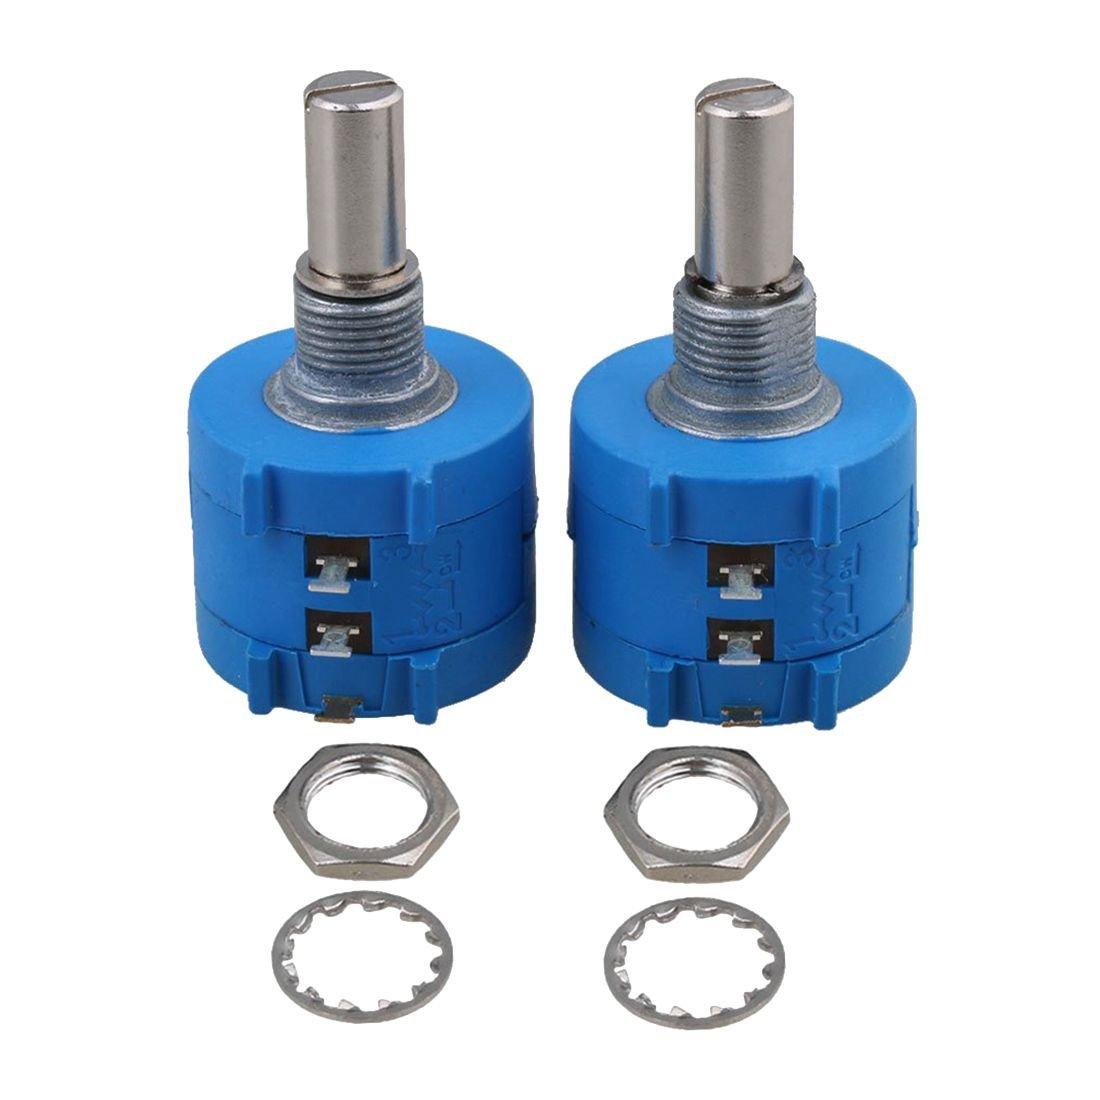 TOOGOO(R) 2 Pcs 10-Turn Rotary Wirewound Precision Potentiometer Pot Set 5K ohms